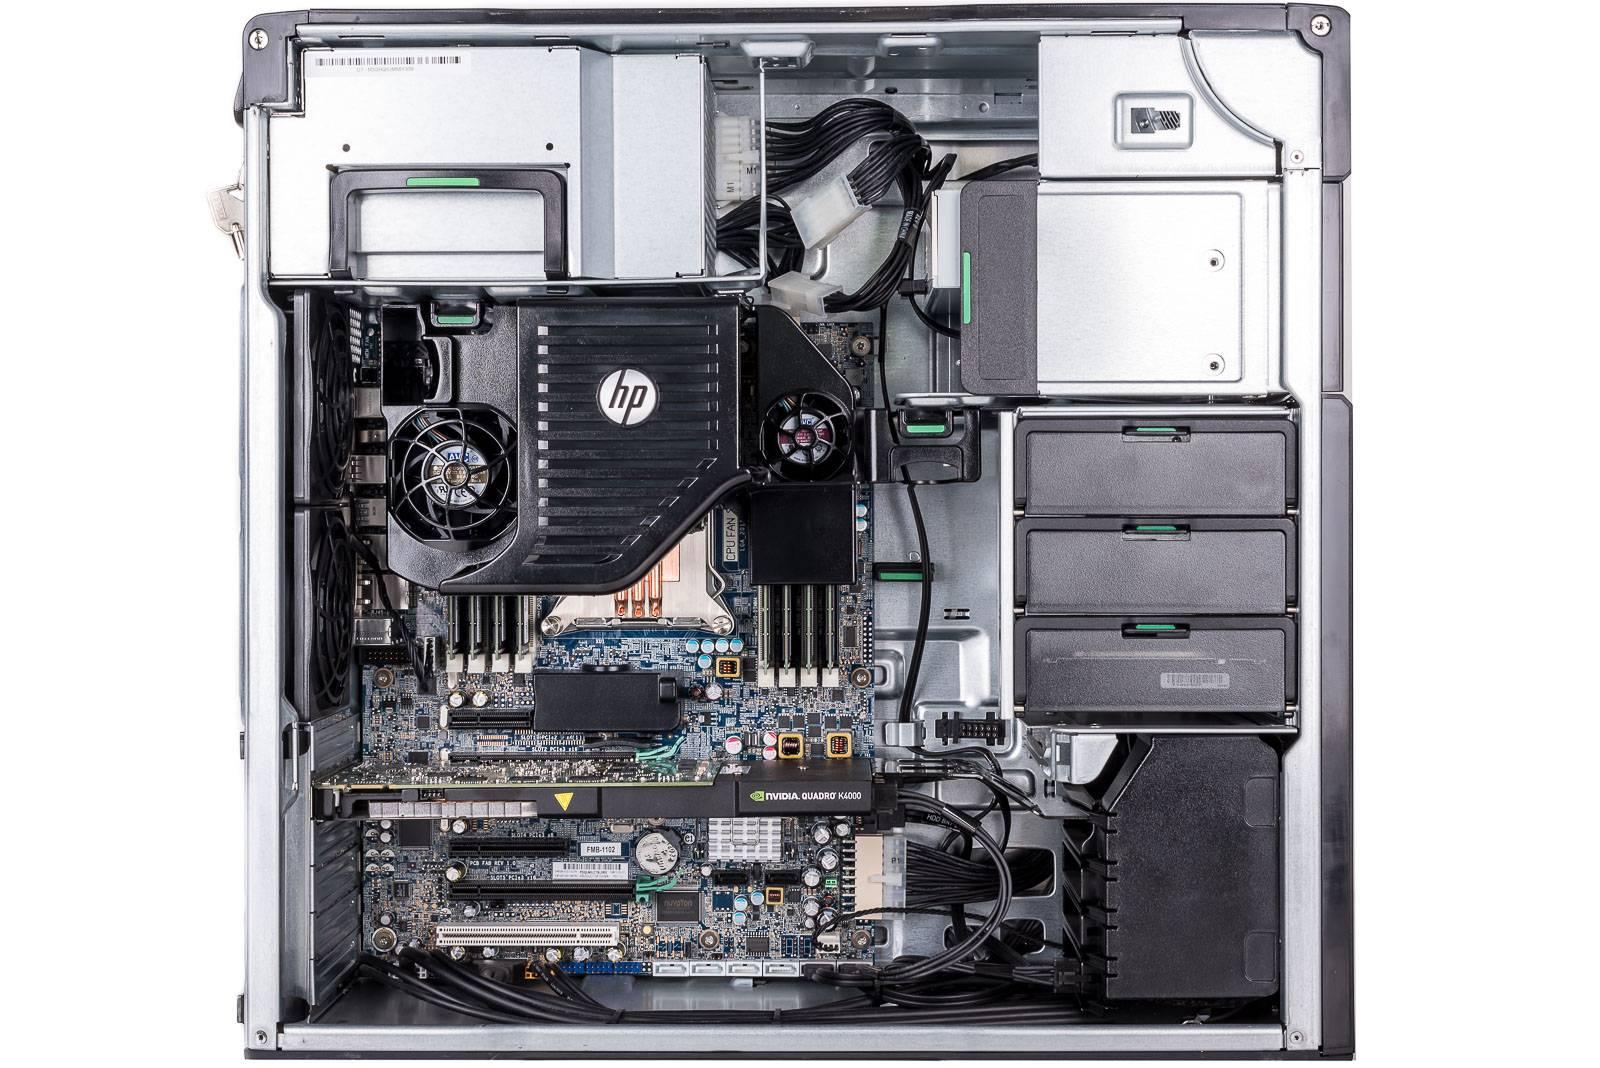 Dual Boot - Desktop Power Switch SSD - M 2 PCIe - Linux Mint